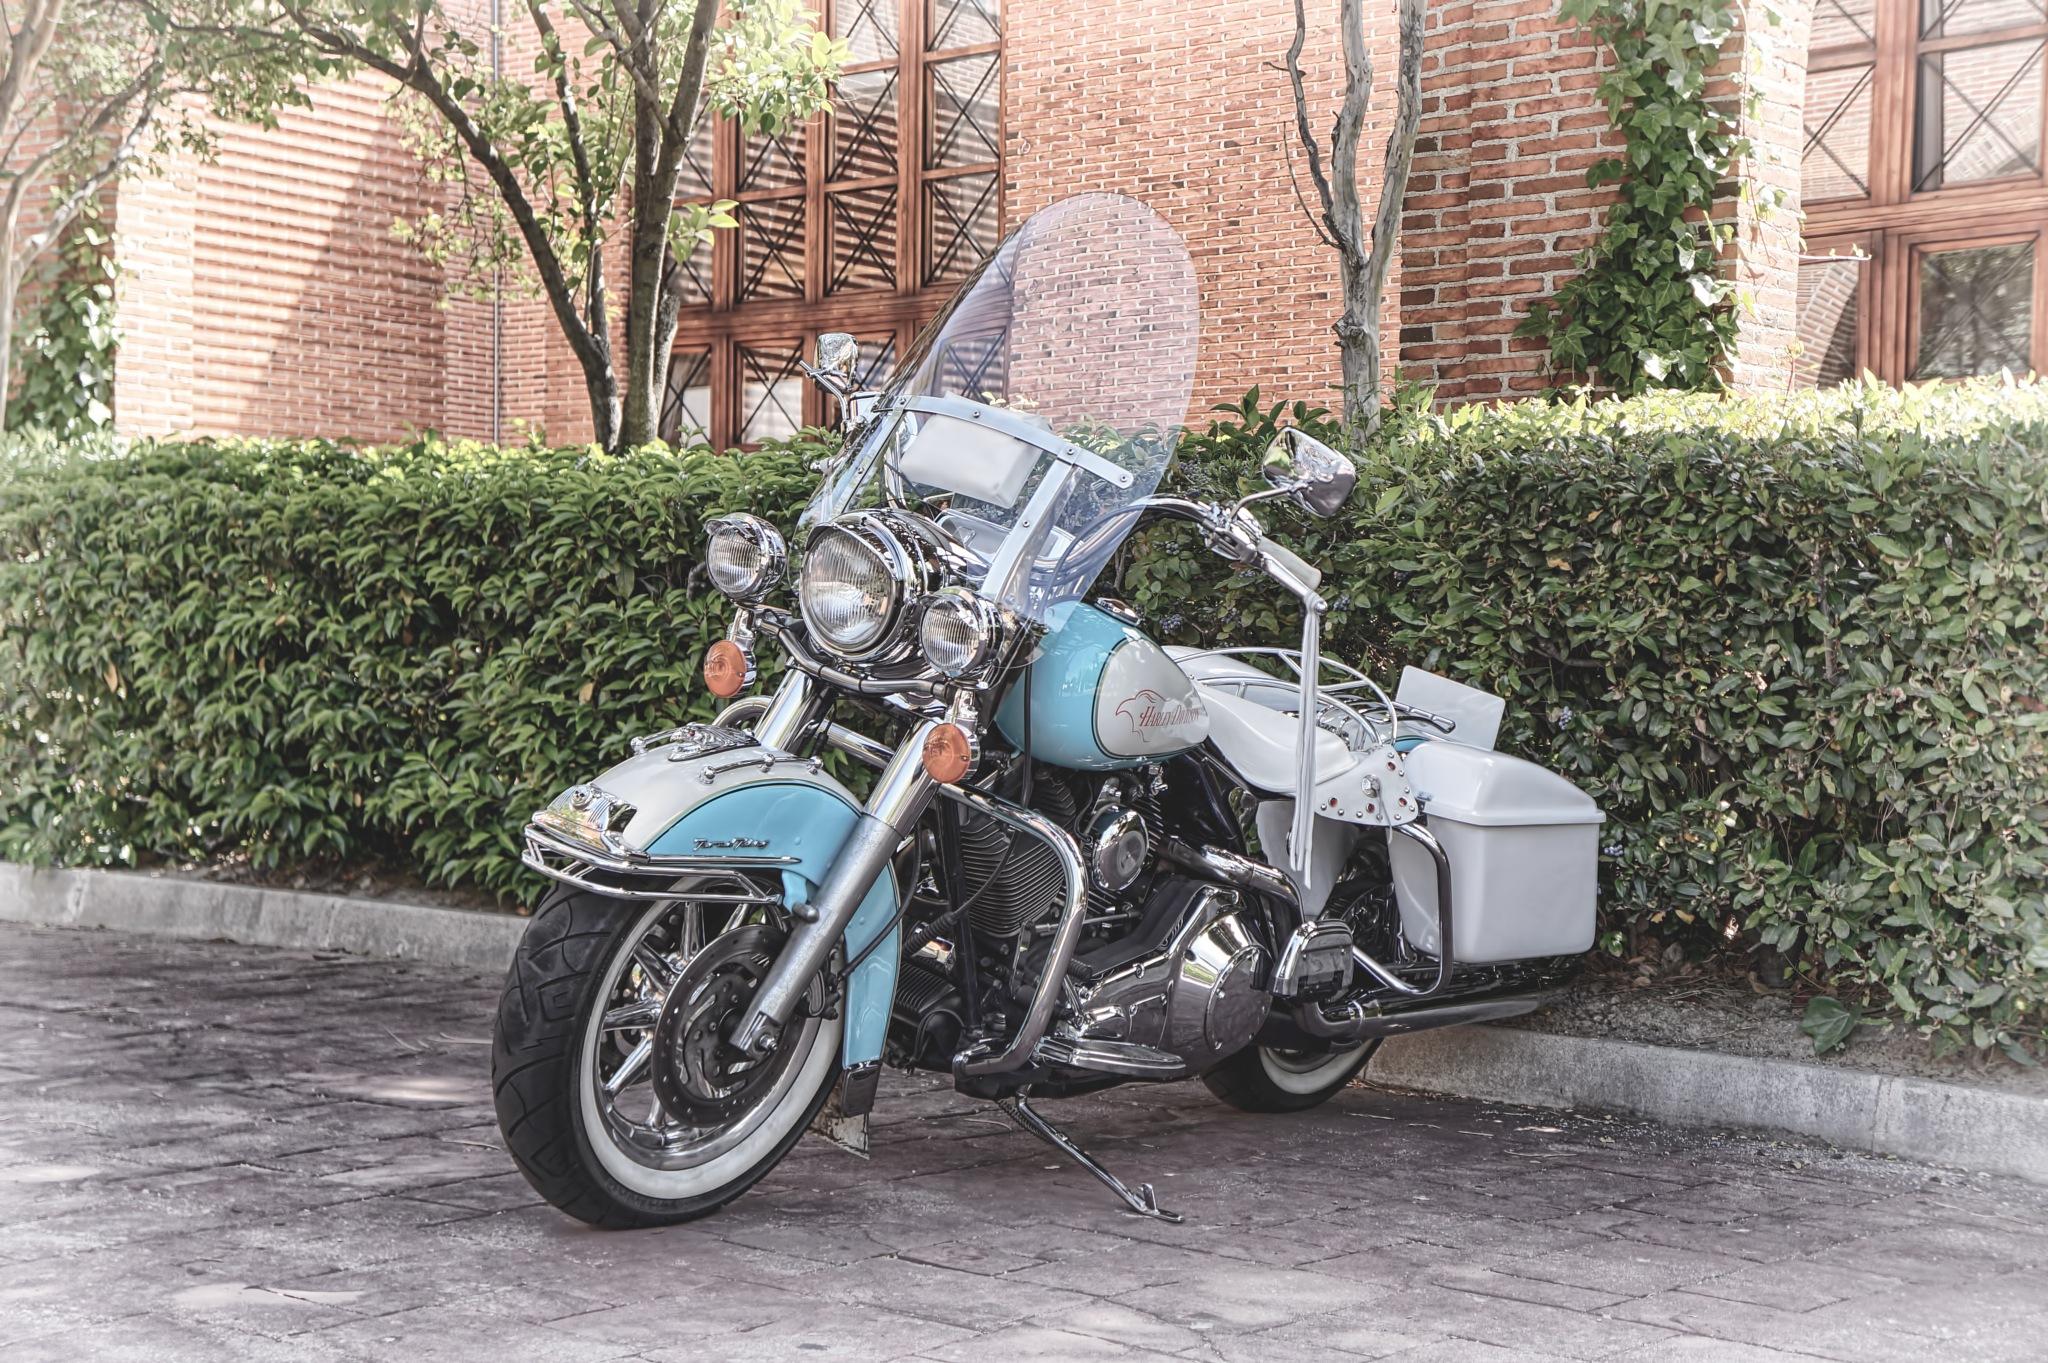 Harley Davidson Road King by Miguel Ángel Prieto Ciudad